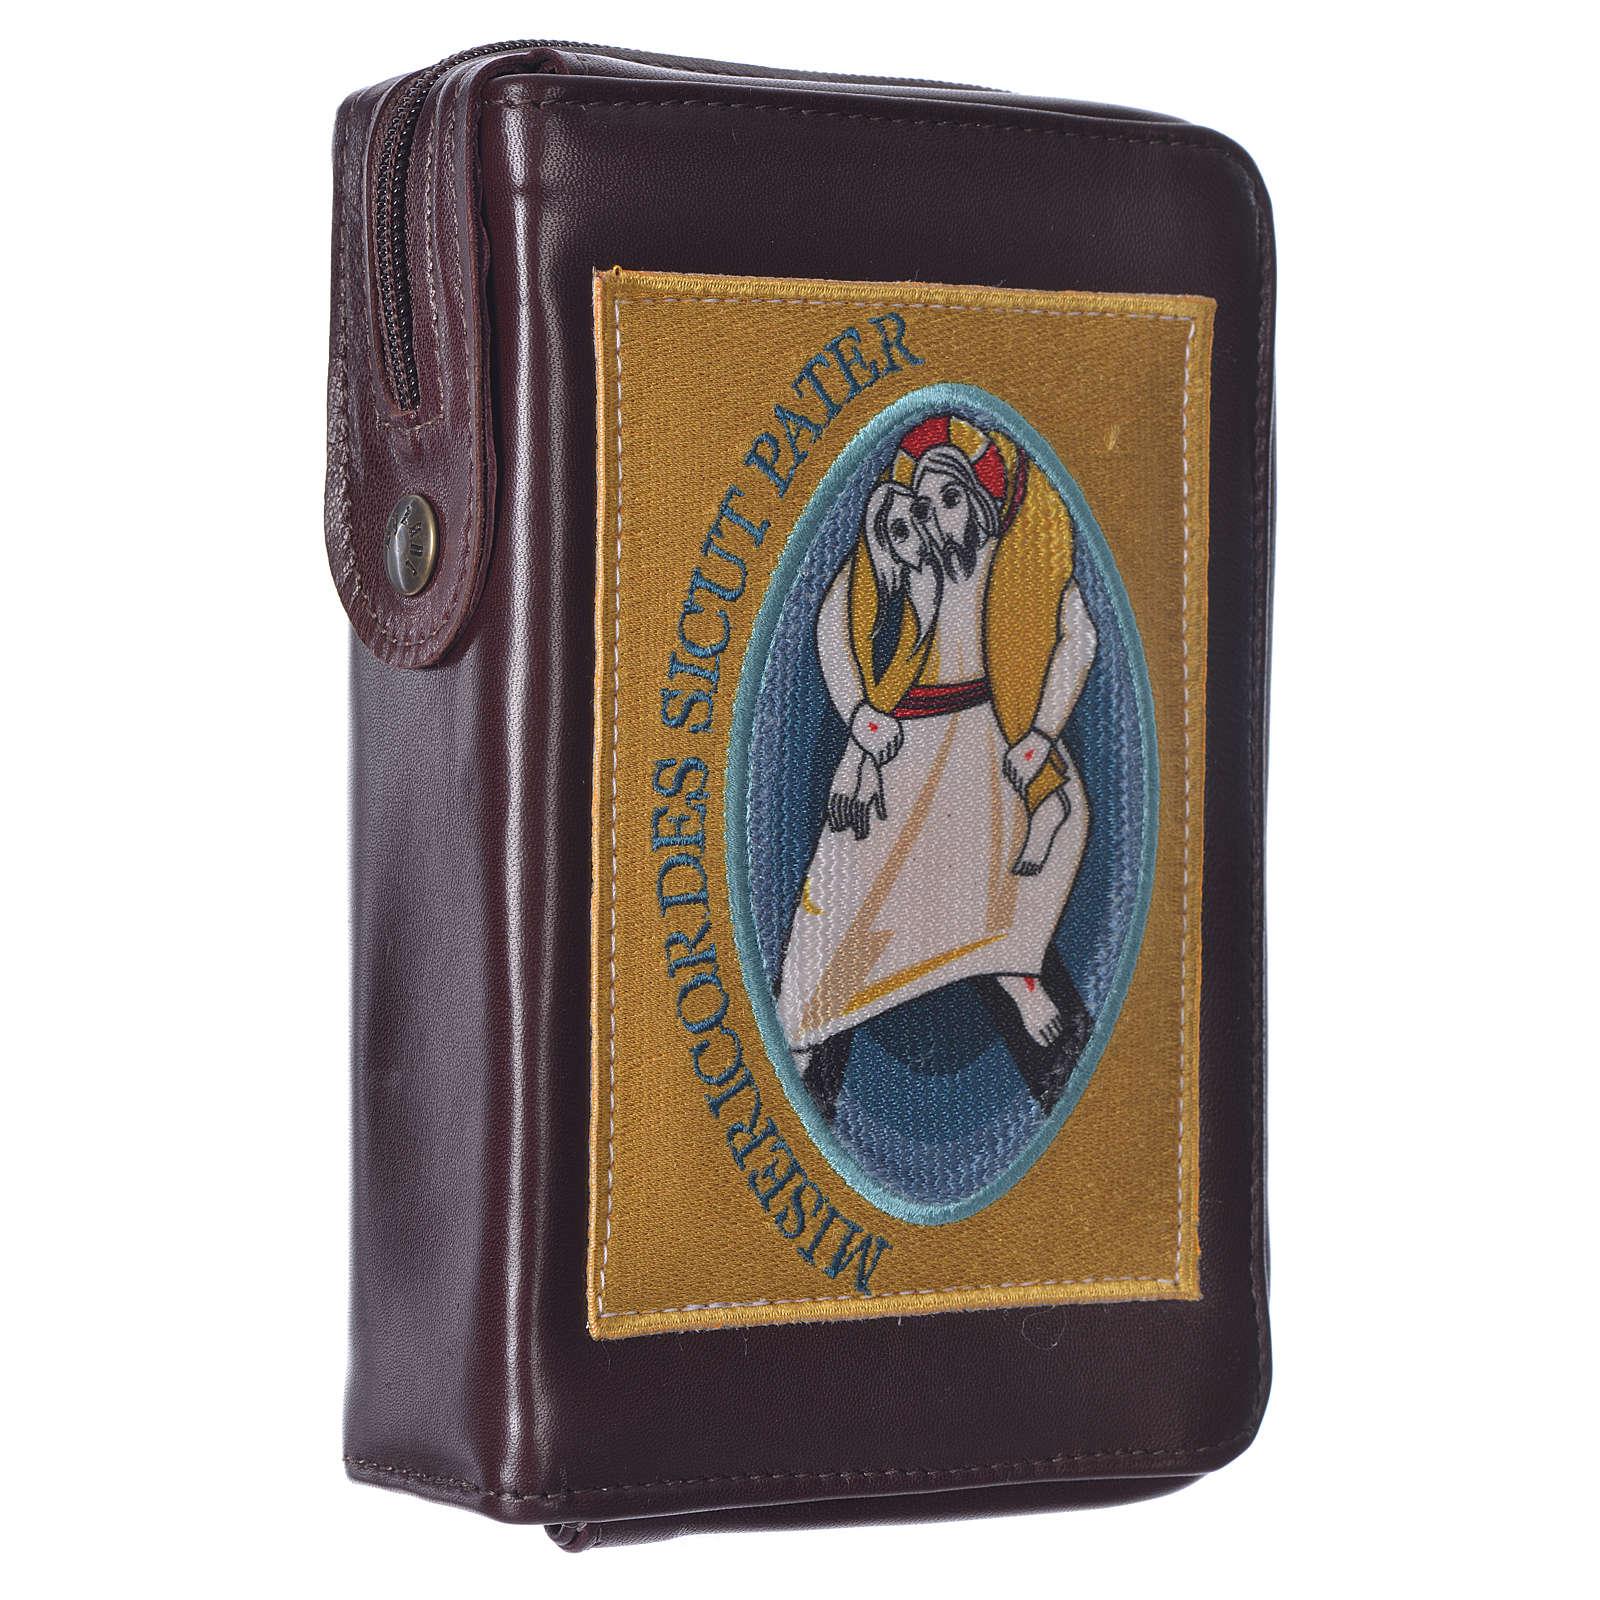 STOCK Custodia Liturgia ore 4 volumi Giubileo Misericordia marrone 4